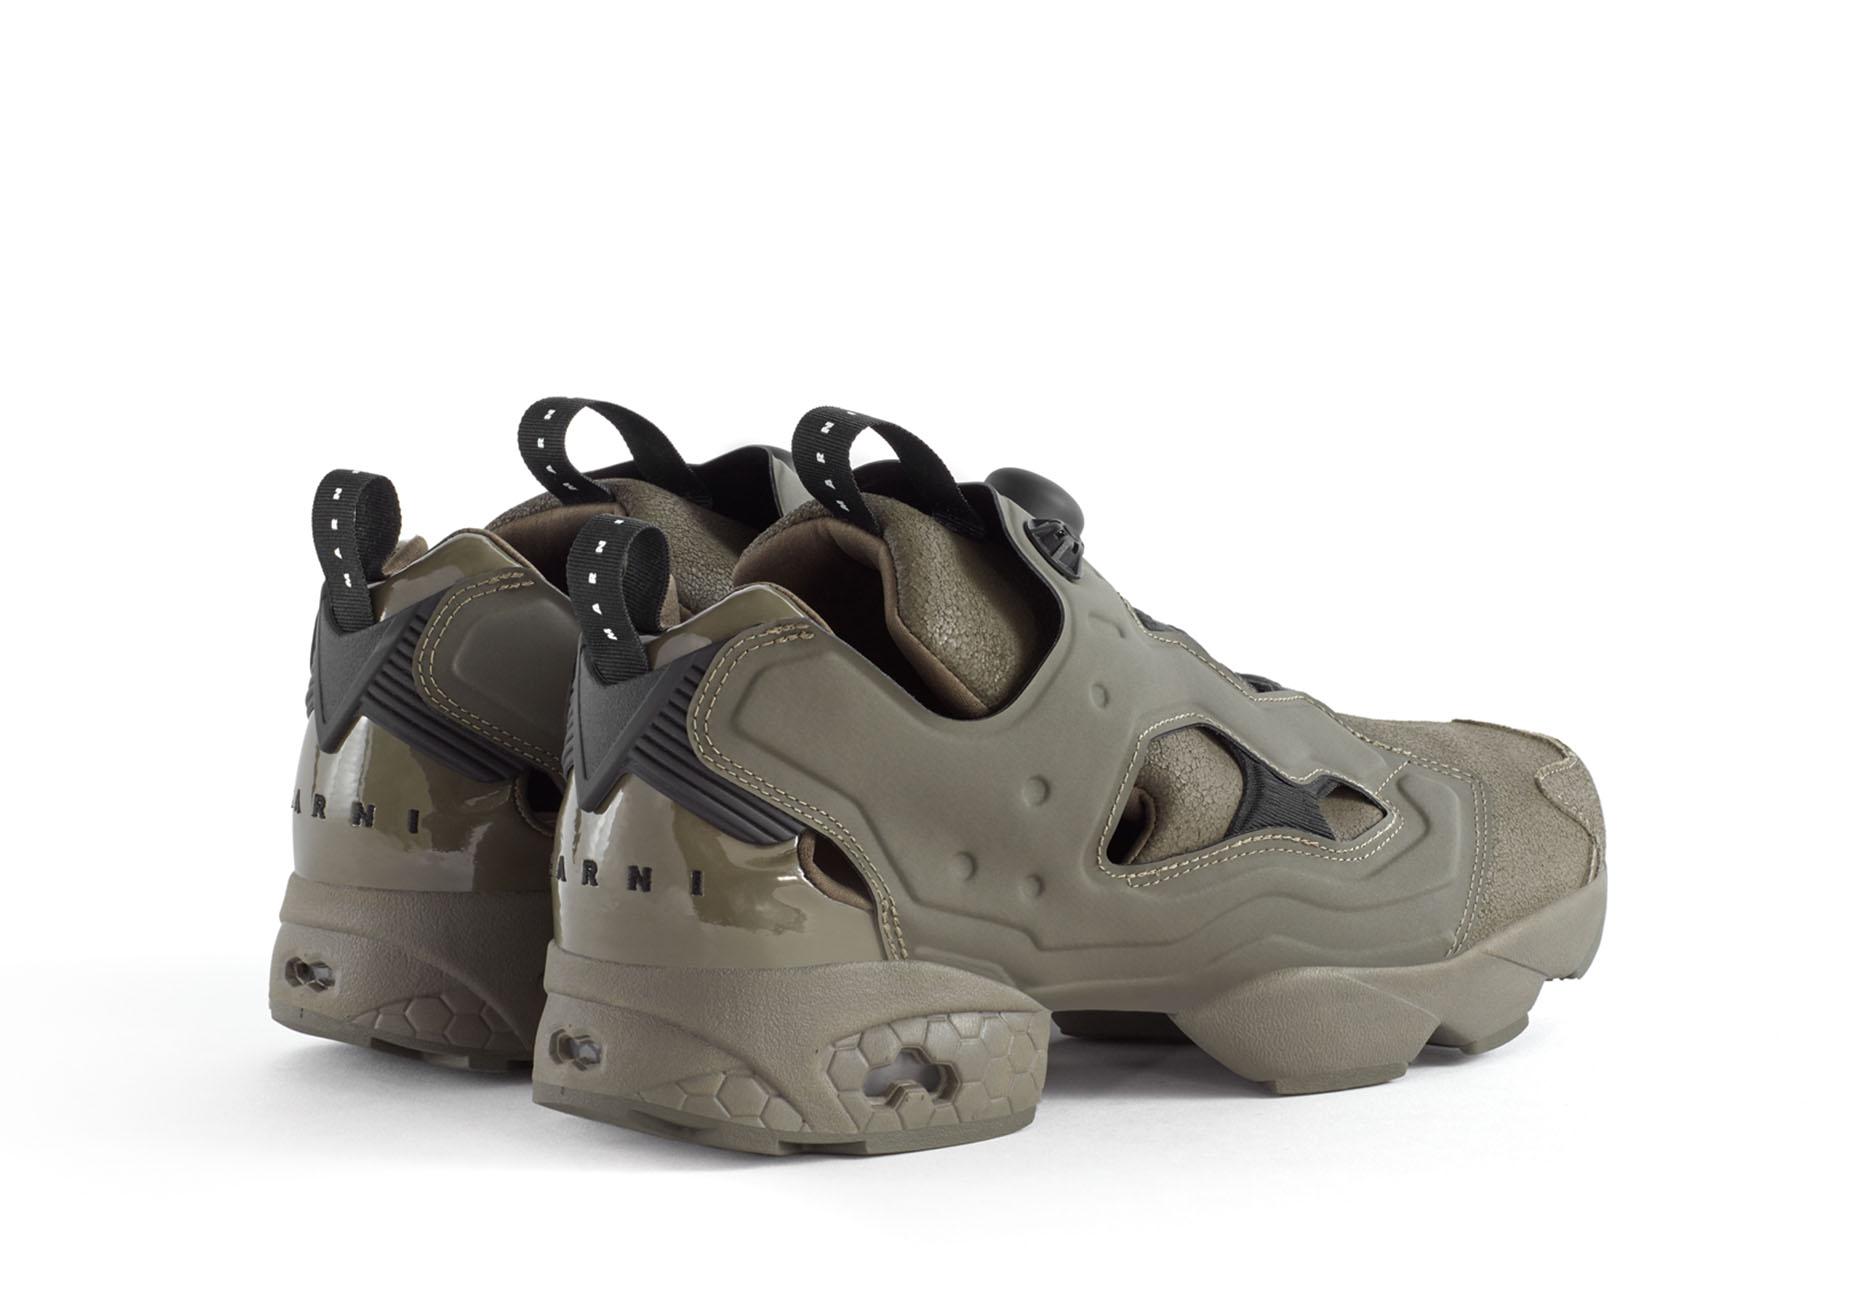 MARNI x Zalando | Shop exclusively at Zalando | Shoes on